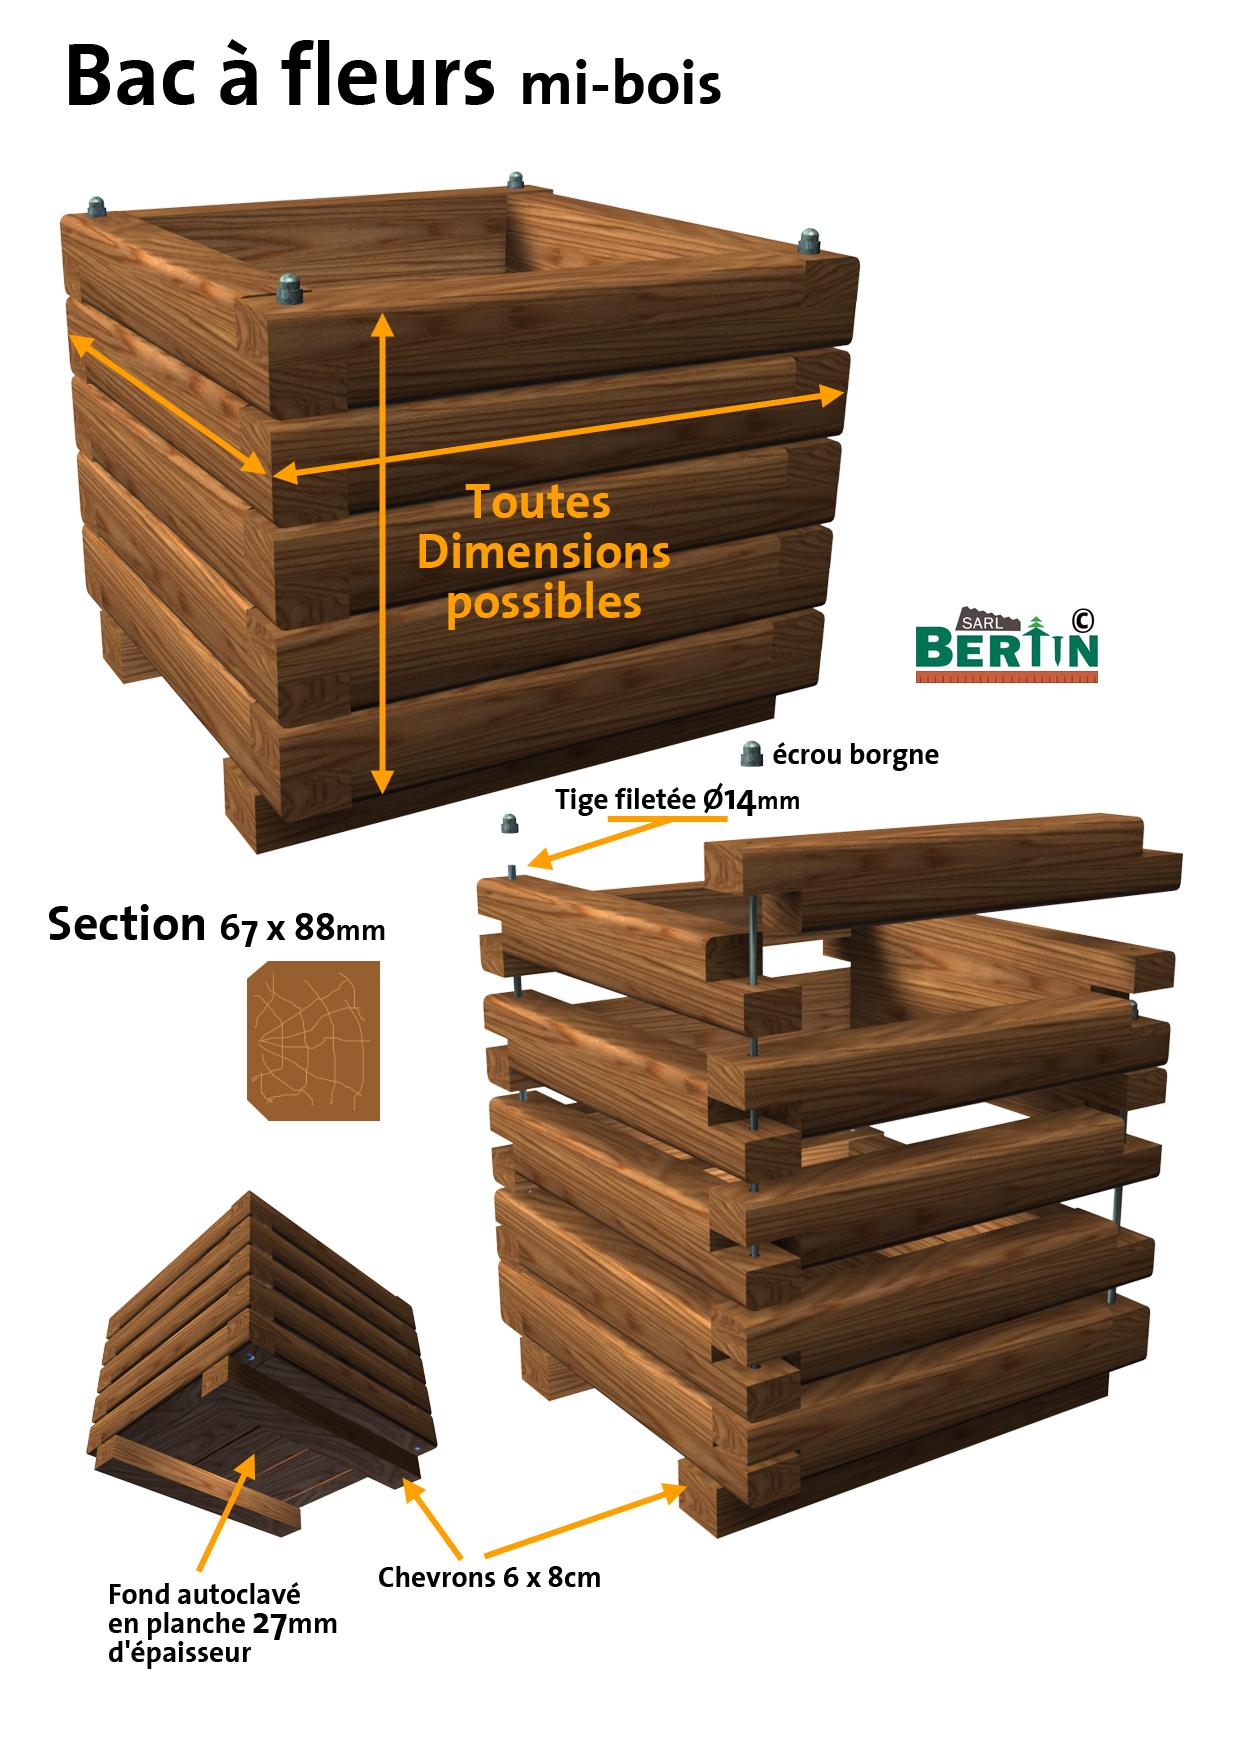 jardini re mibois autoclave 60cmx60cmx53cm menuiserie bertin. Black Bedroom Furniture Sets. Home Design Ideas